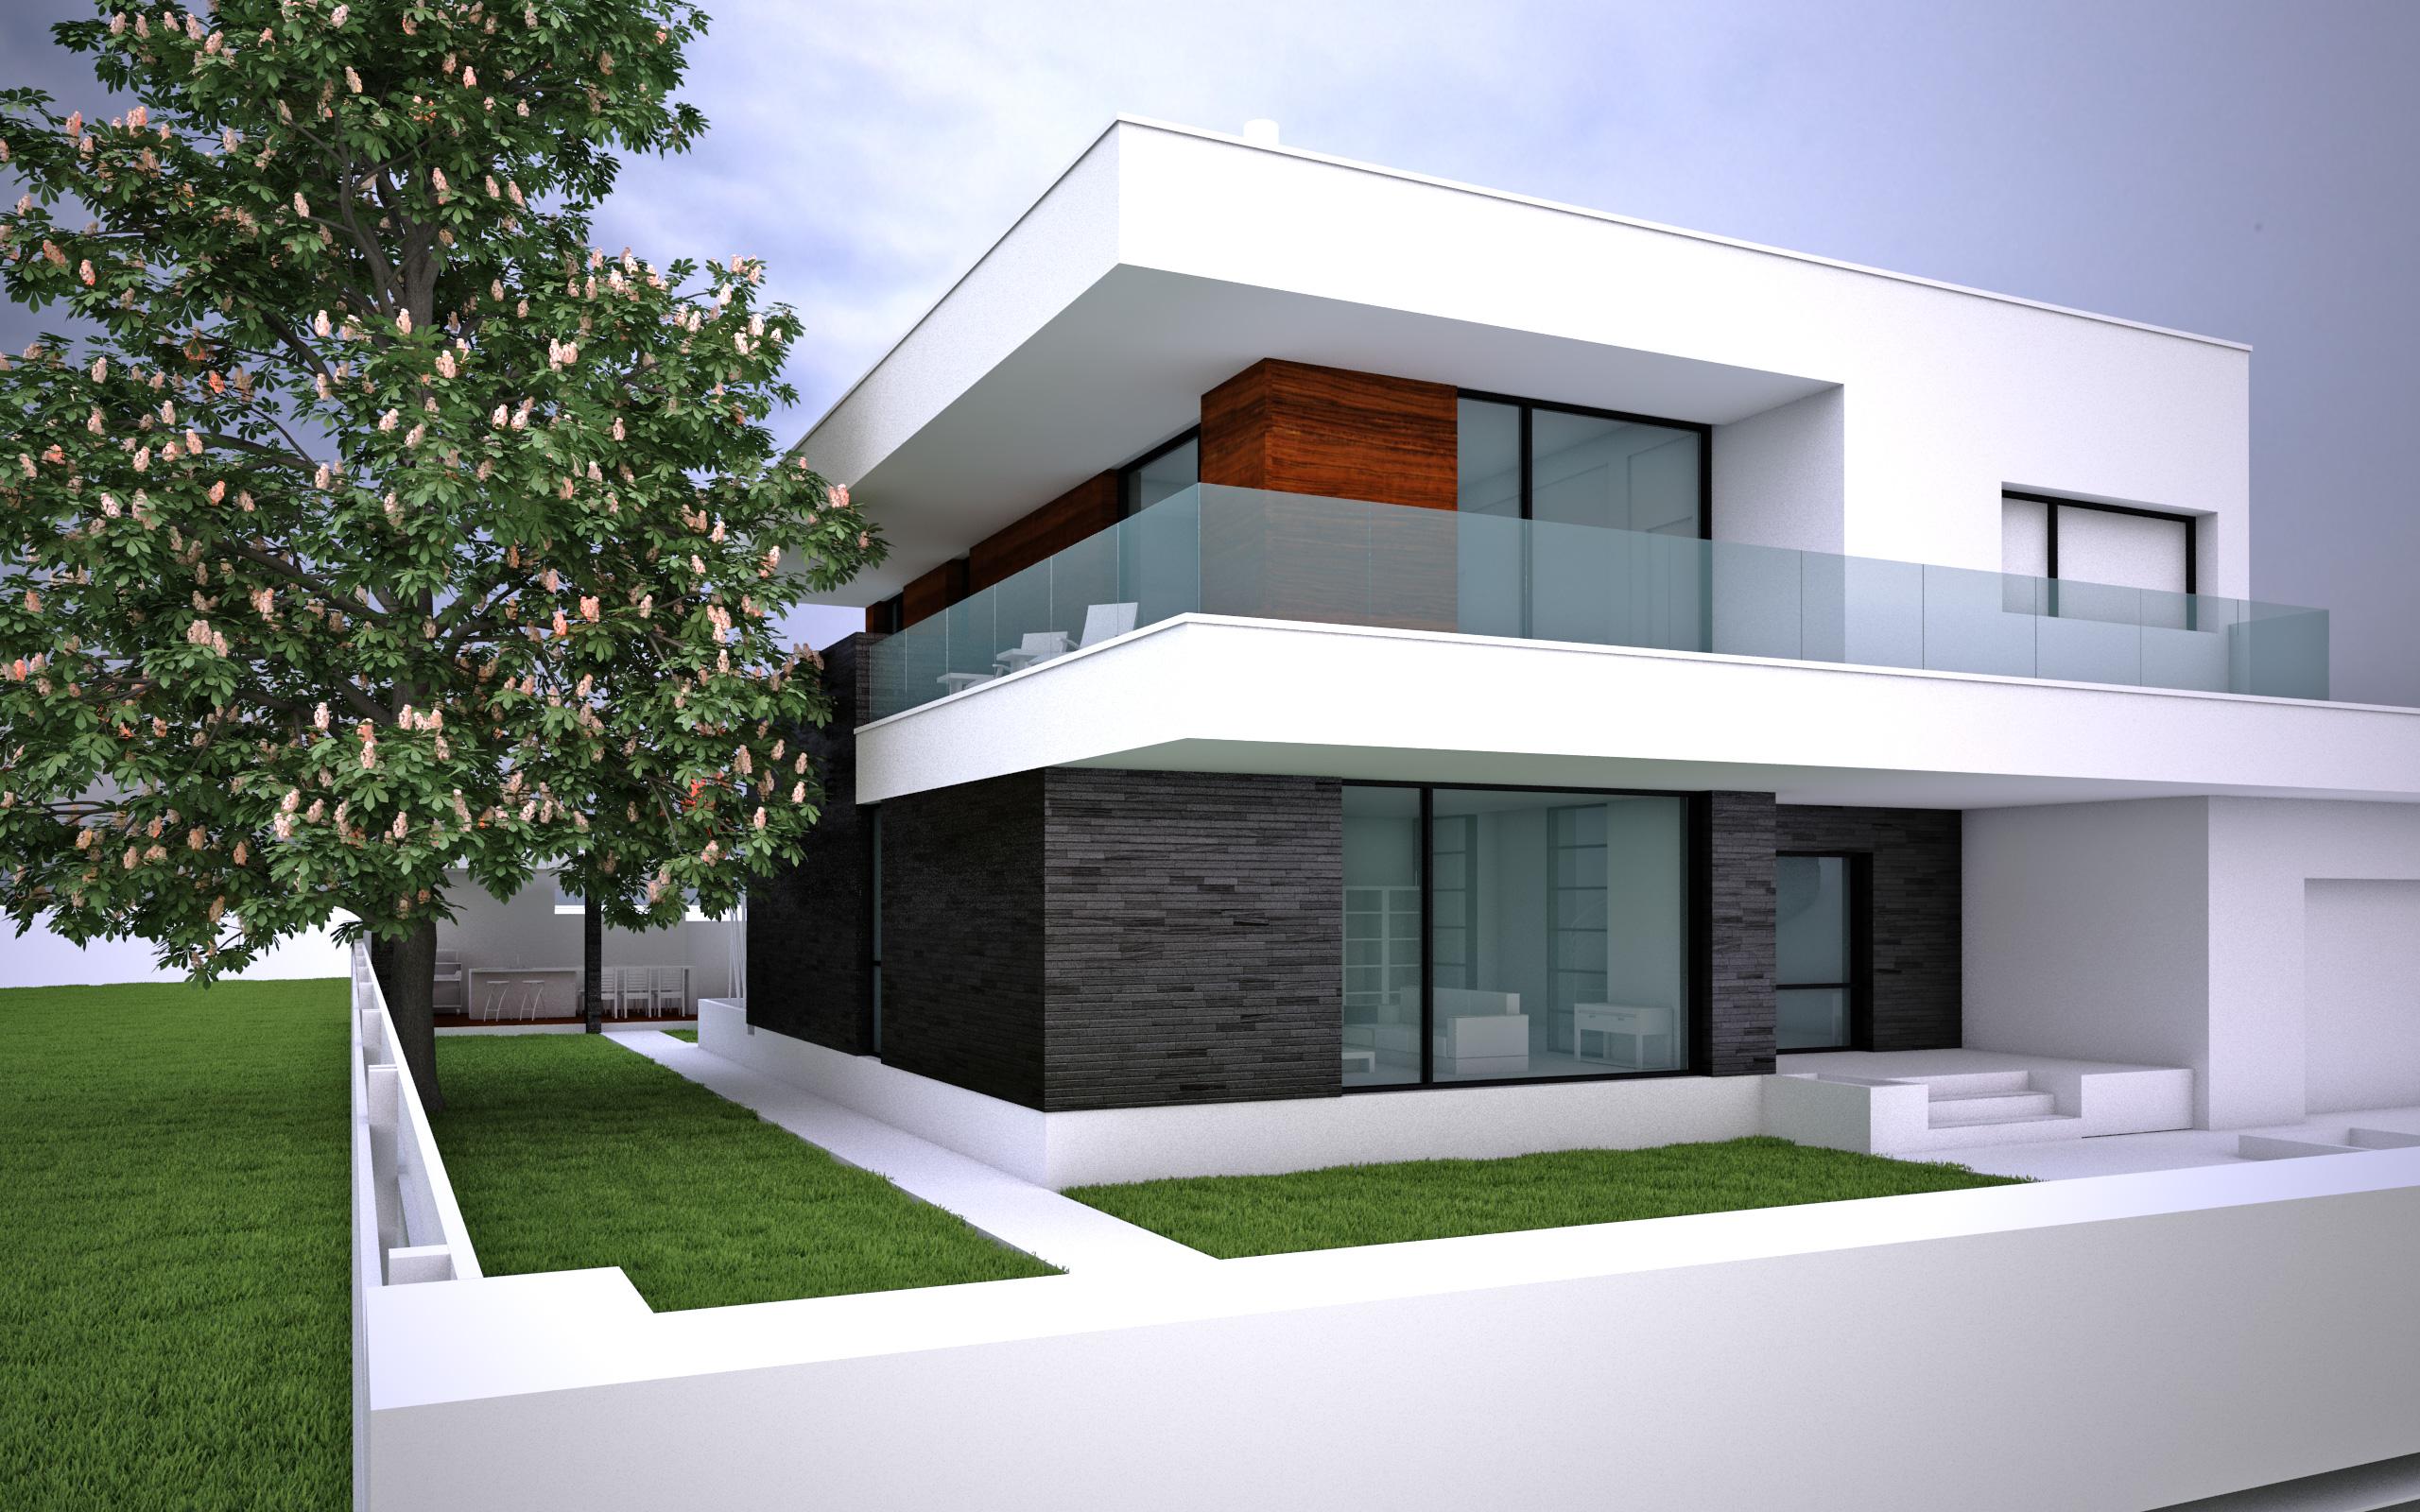 casa-perspectiva-exterioara.jpg